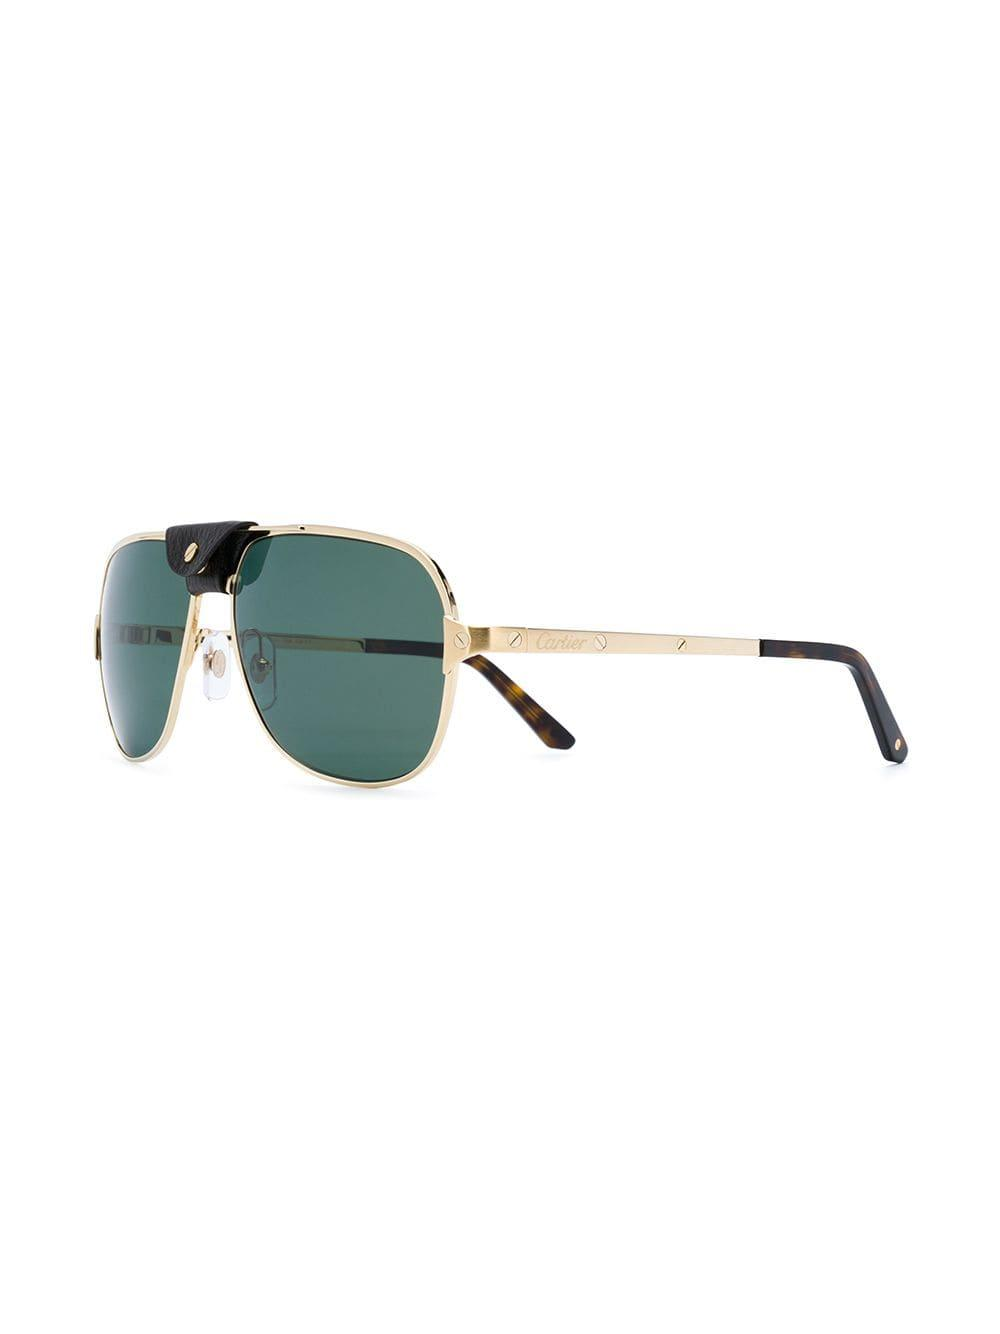 504c60adeb Cartier Santos De Sunglasses in Metallic for Men - Lyst